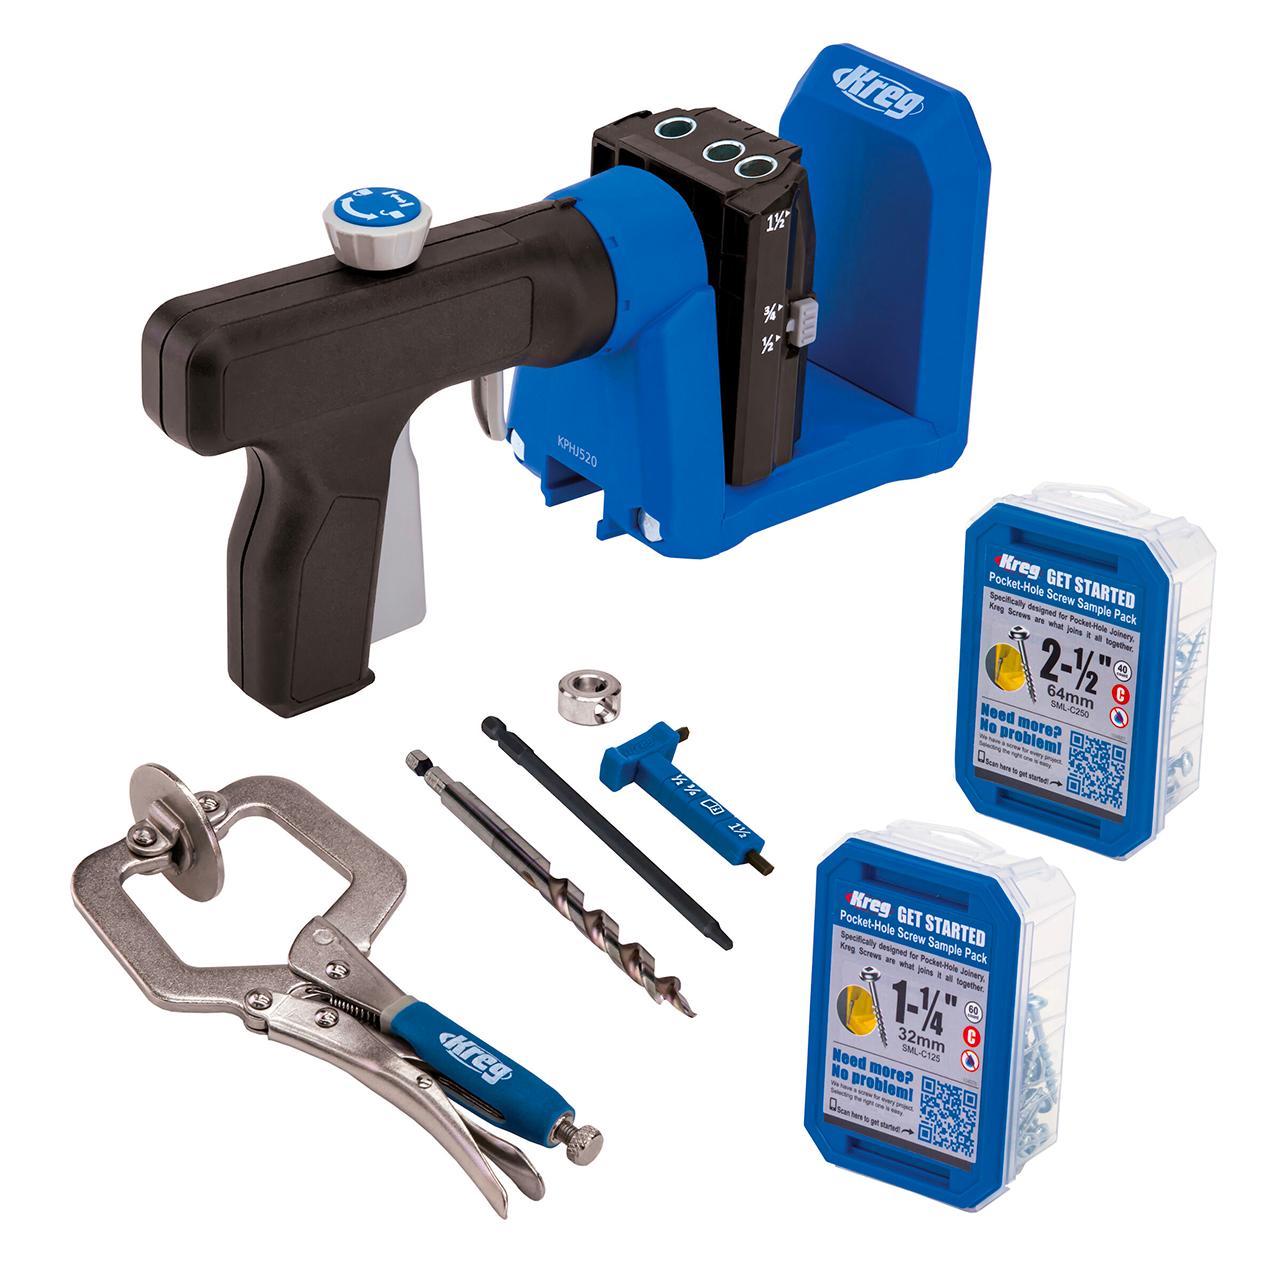 Kreg Handheld Pocket Hole Jig-Pro